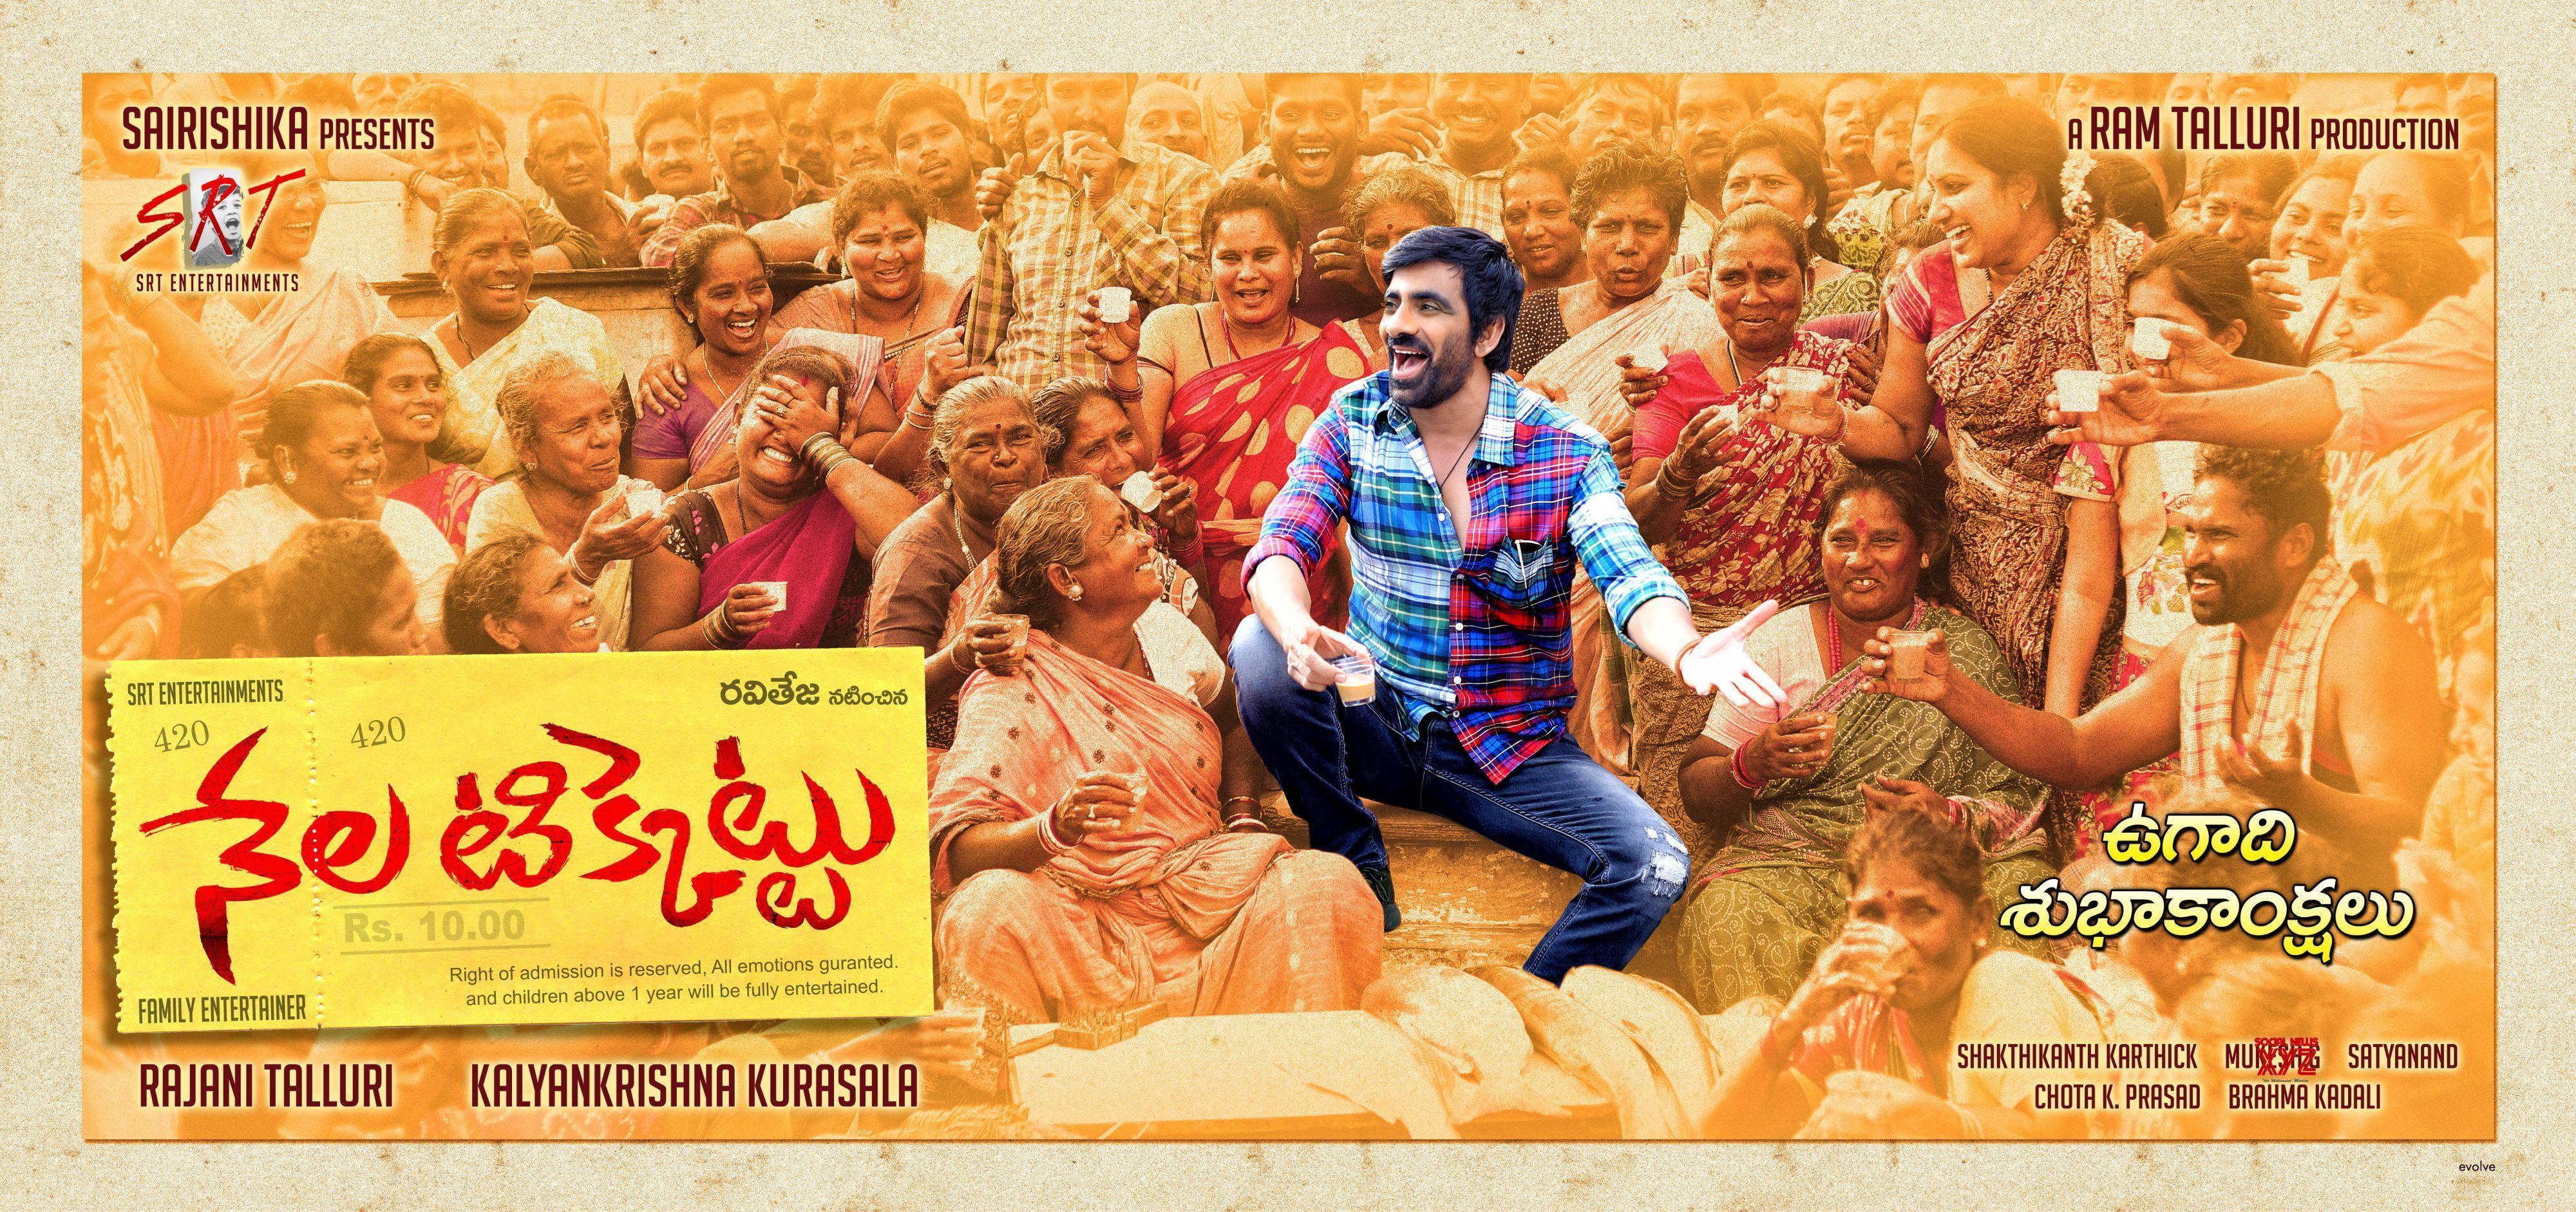 Raviteja, Director Kalyan Krishna & SRT Entertainments Movie 'Nela